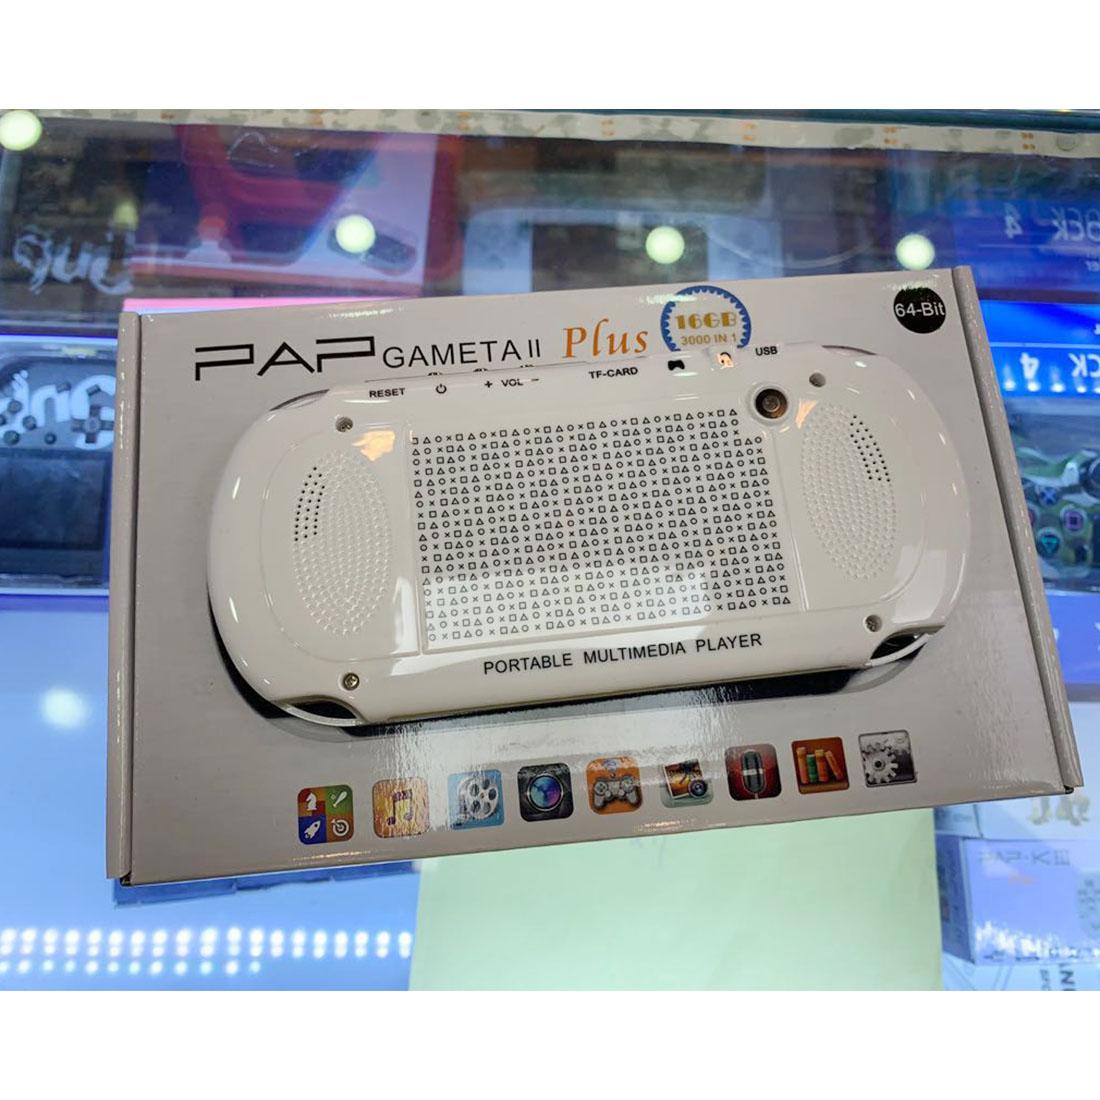 PAP GAMETA2 64 Bit Handheld Game Console Machine